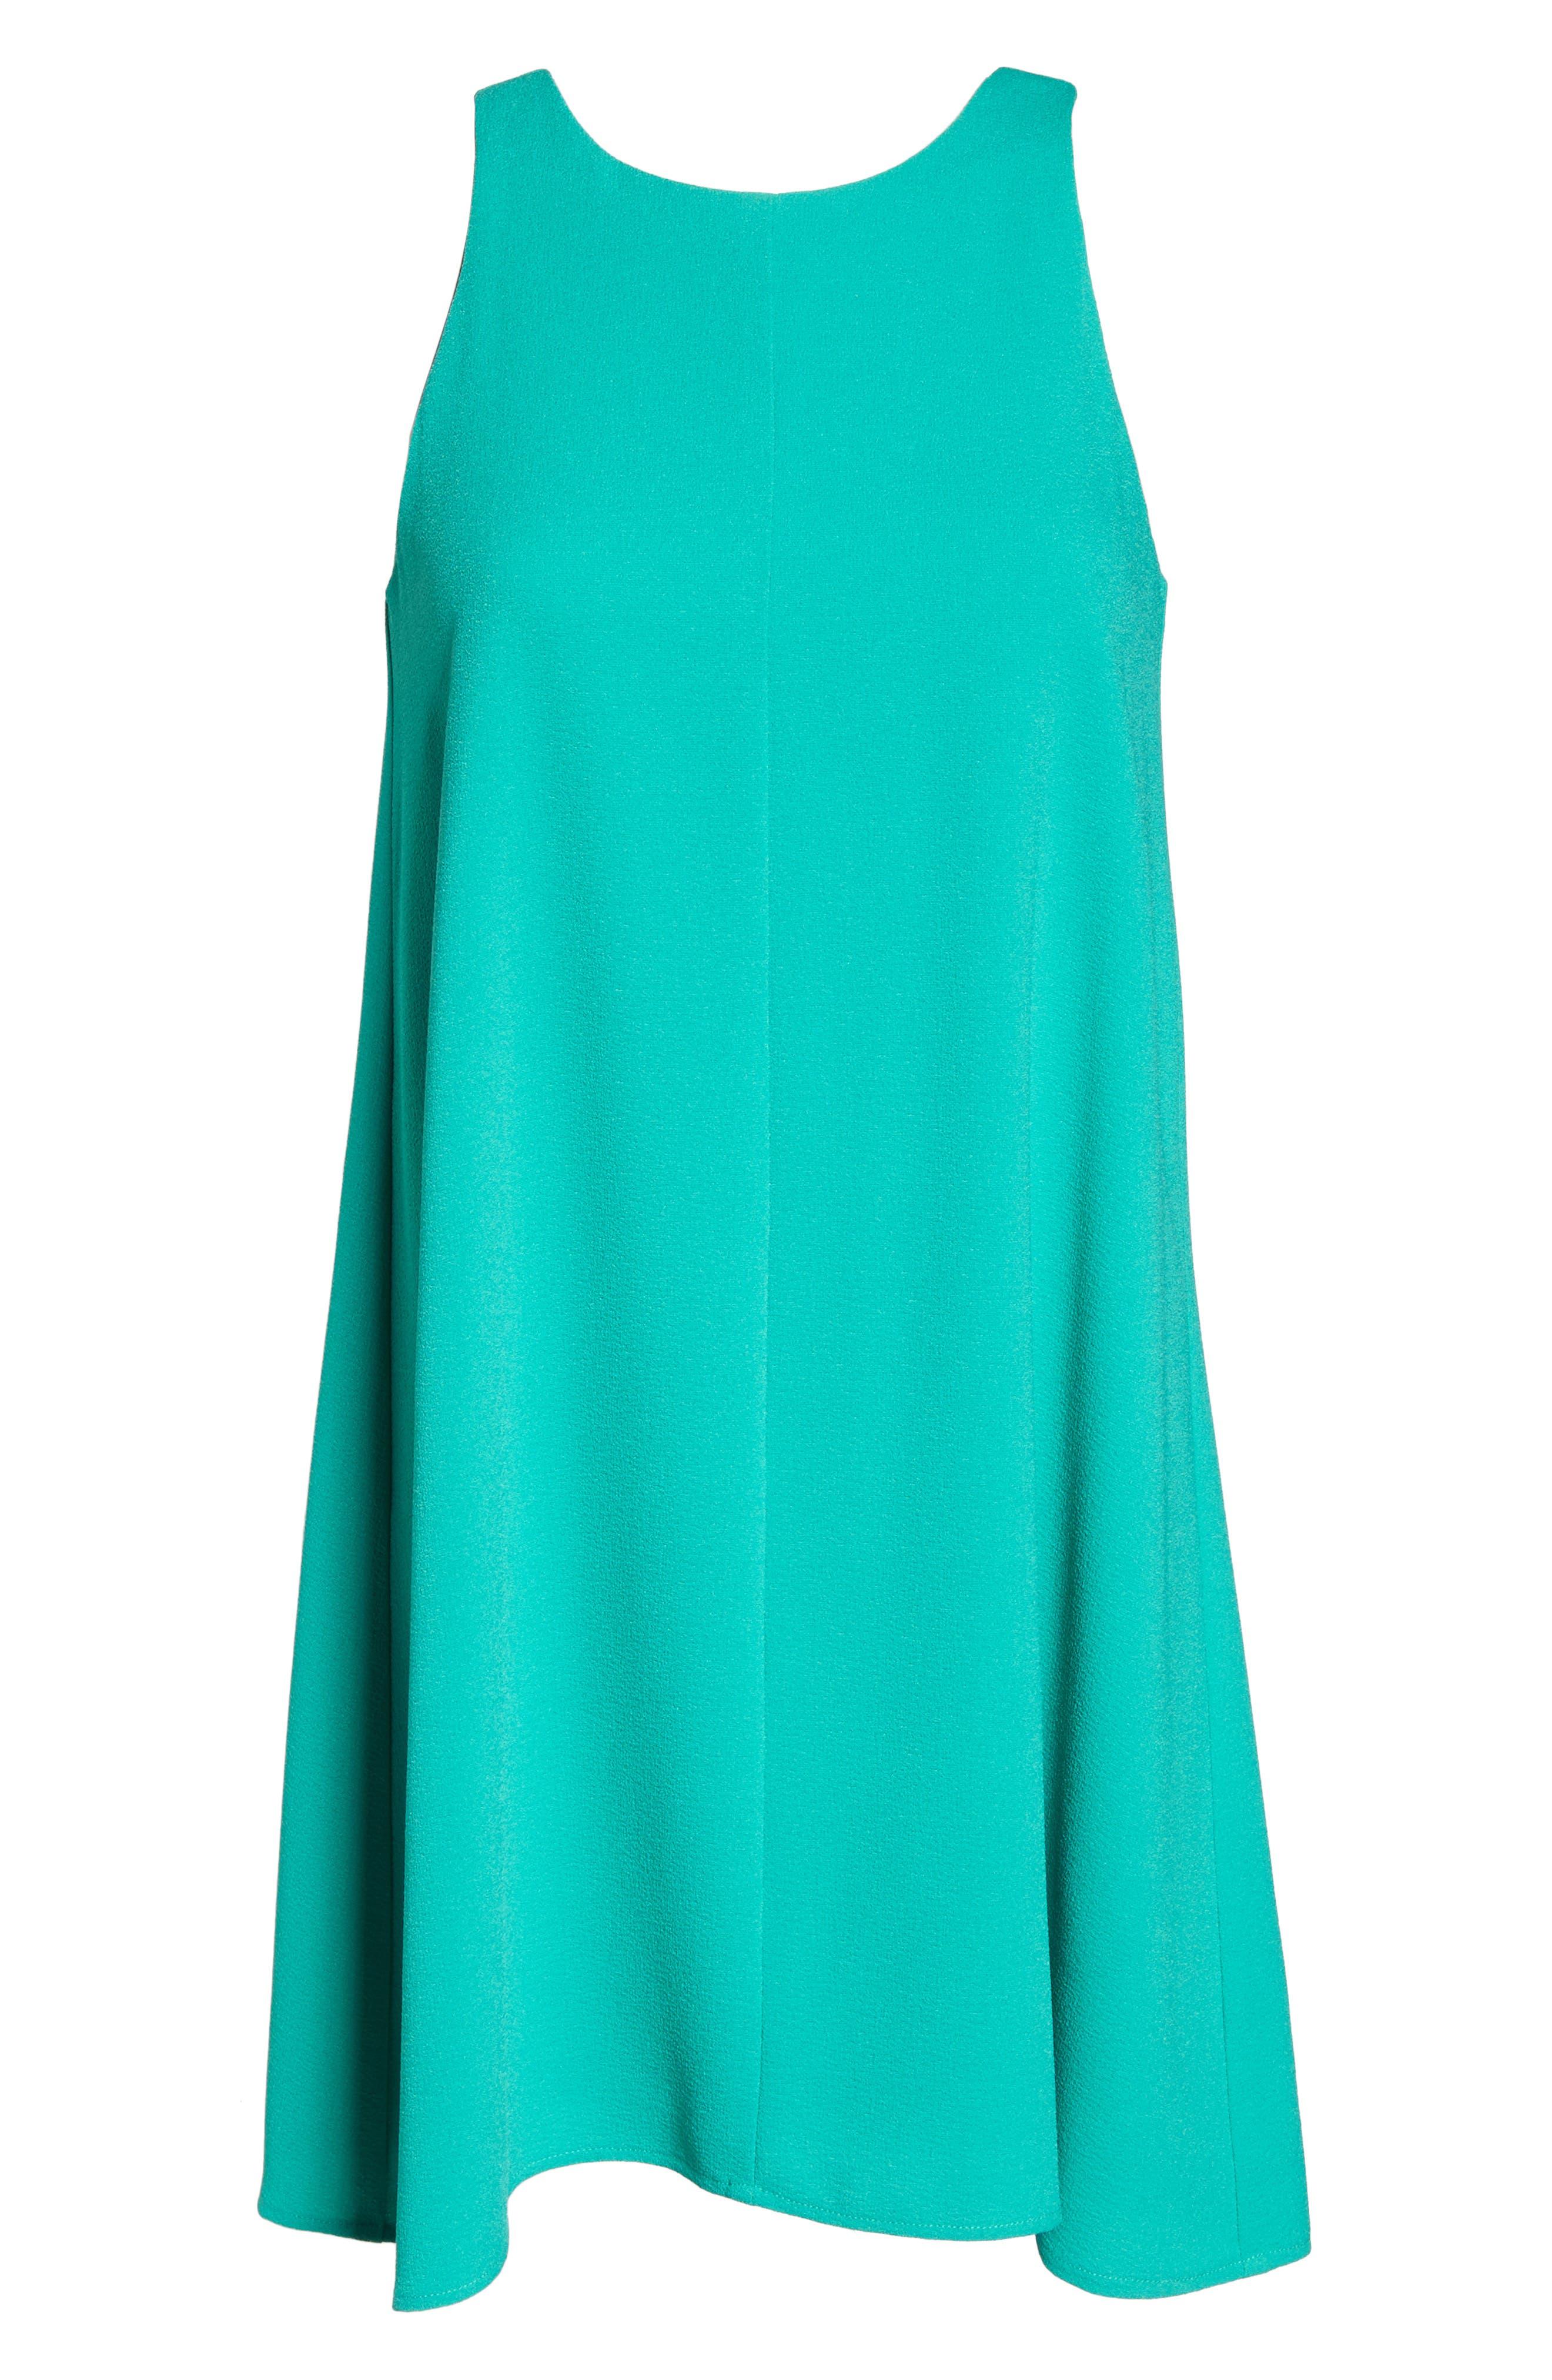 Bow Back Sleeveless Trapeze Dress,                             Alternate thumbnail 6, color,                             320